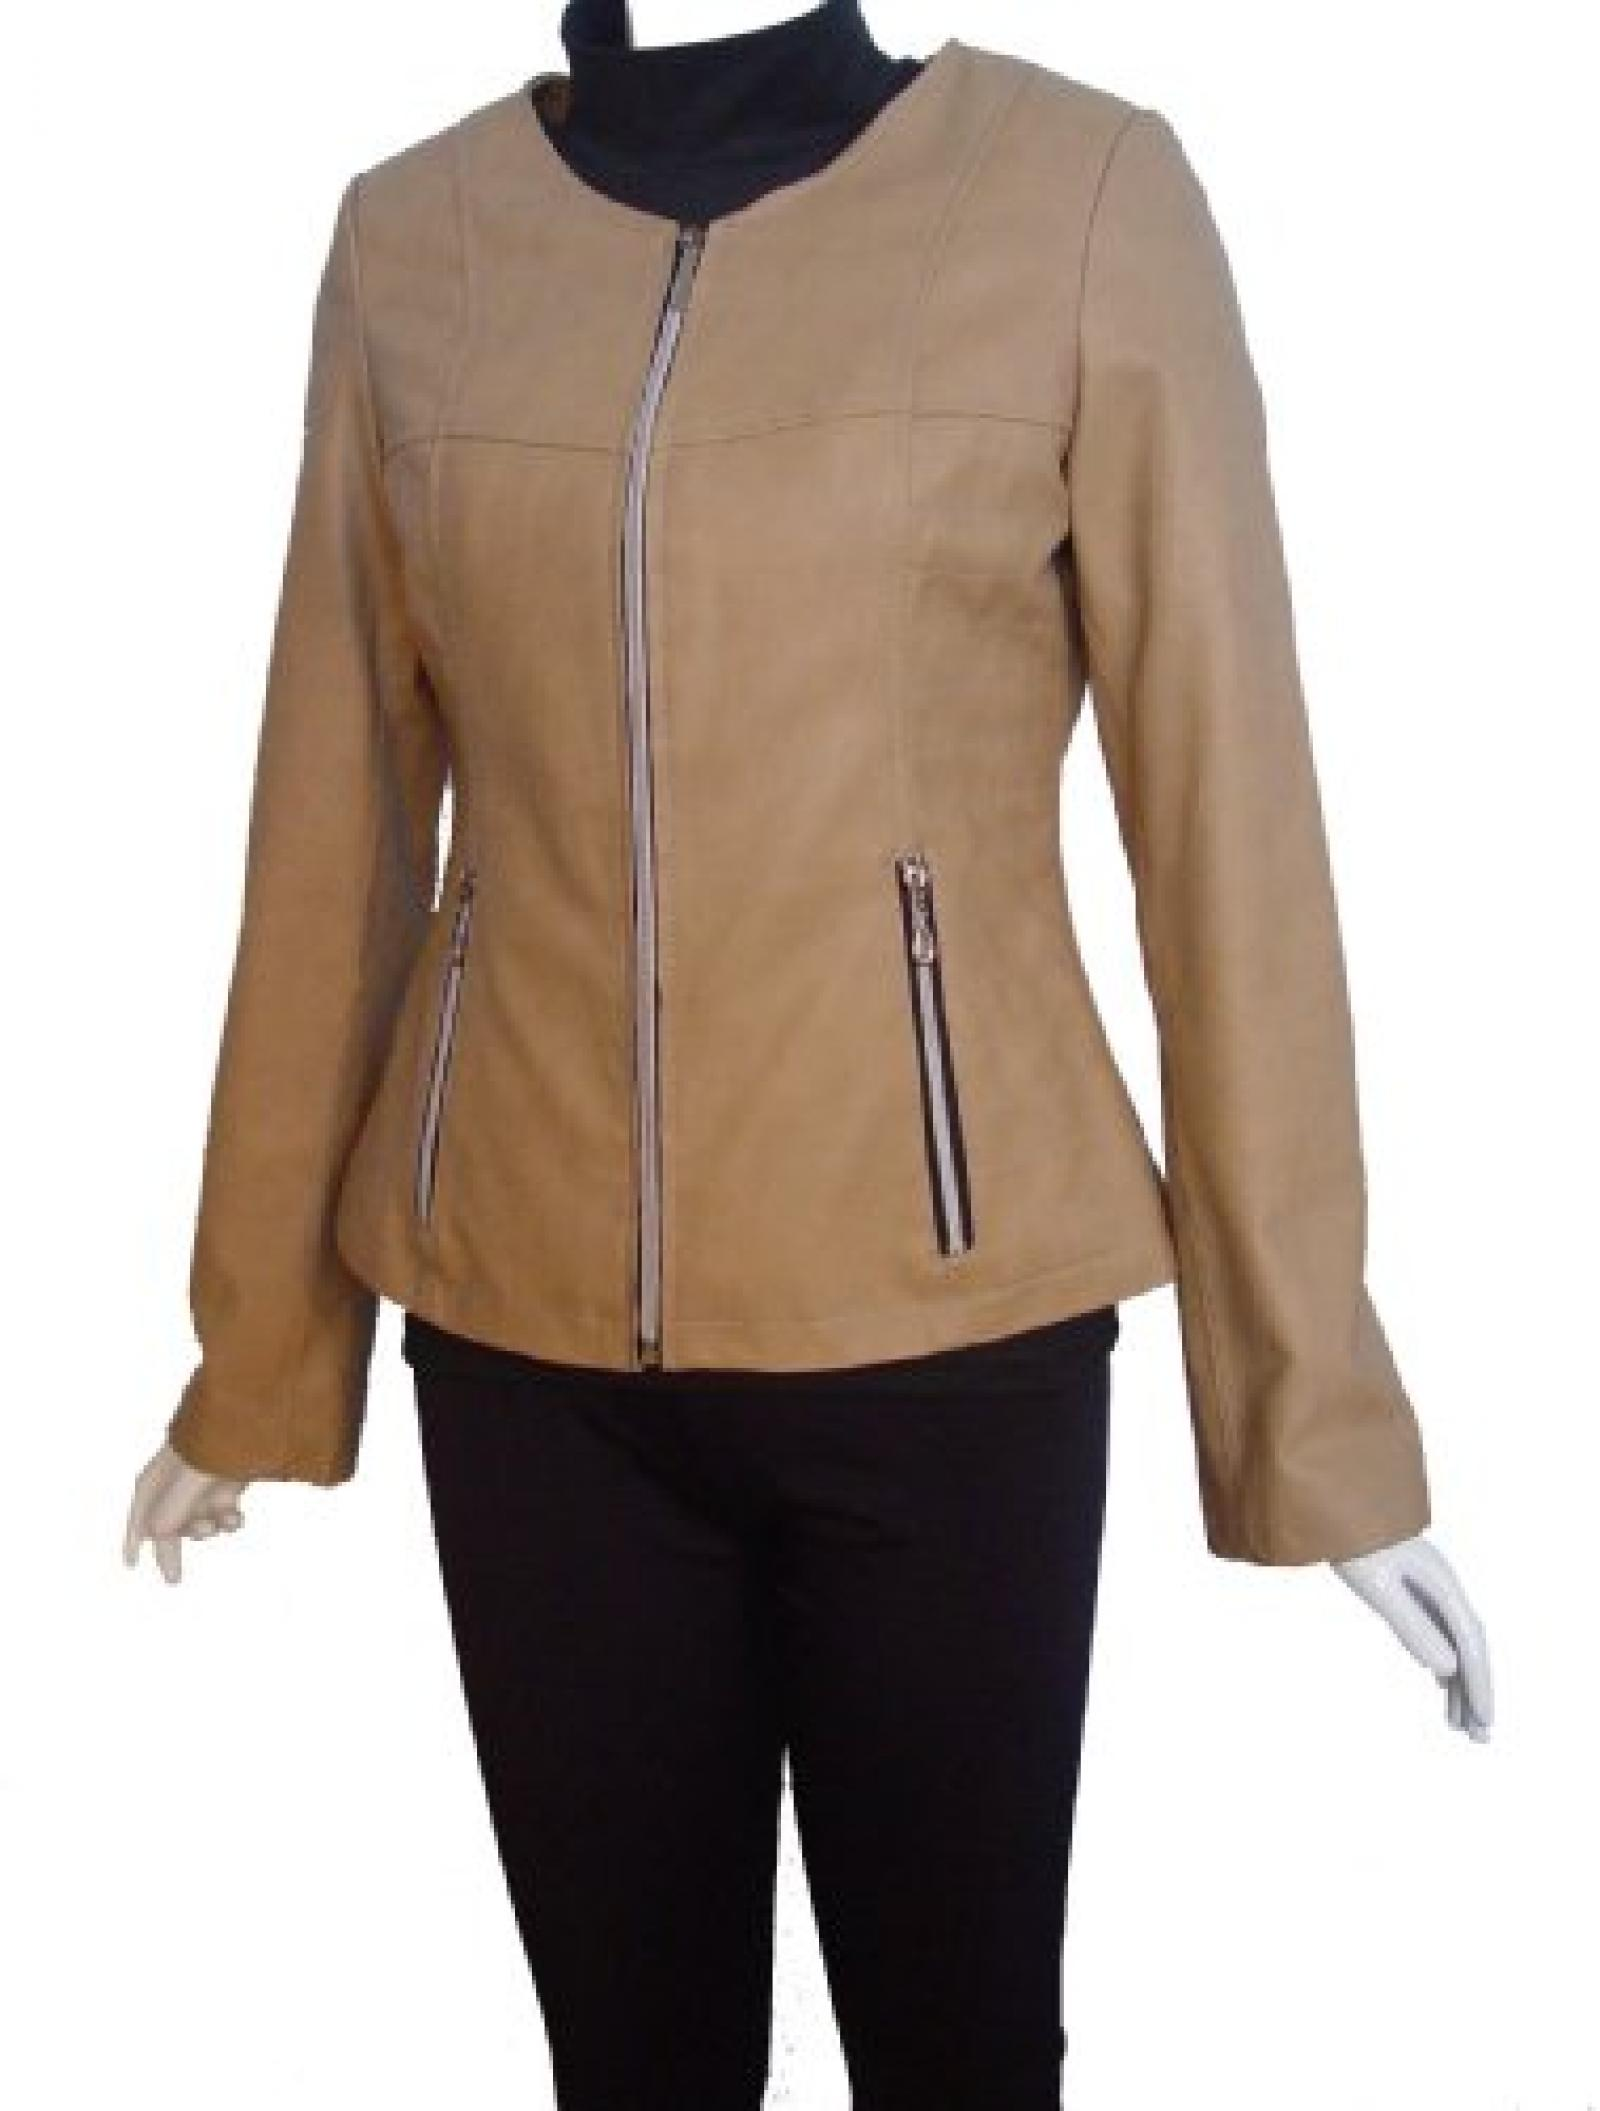 Nettailor FREE tailoring Women PETITE SZ 4067 Leather Moto Jacket Collarless